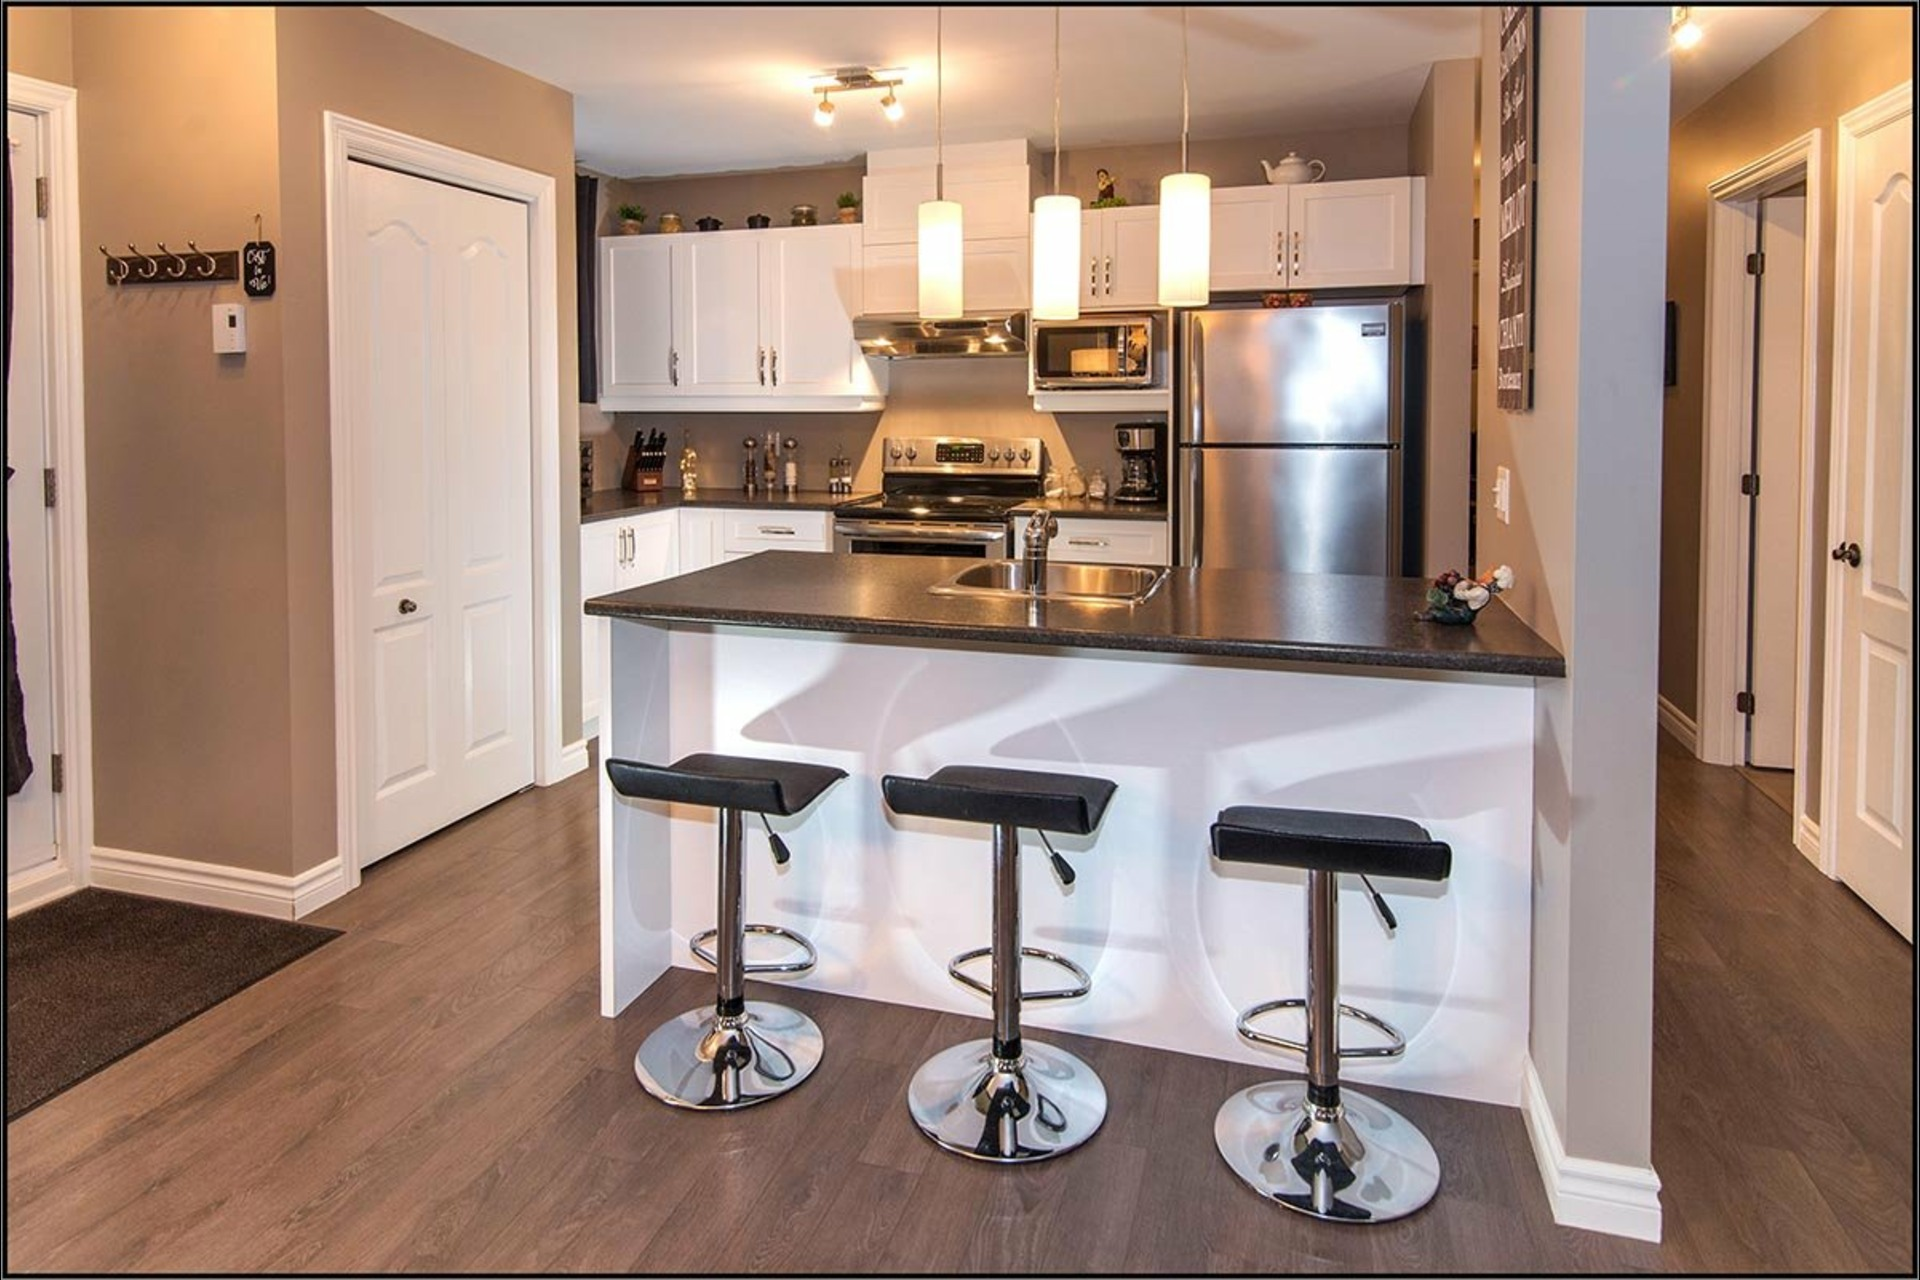 image 4 - Apartment For sale Beauport Québec  - 7 rooms